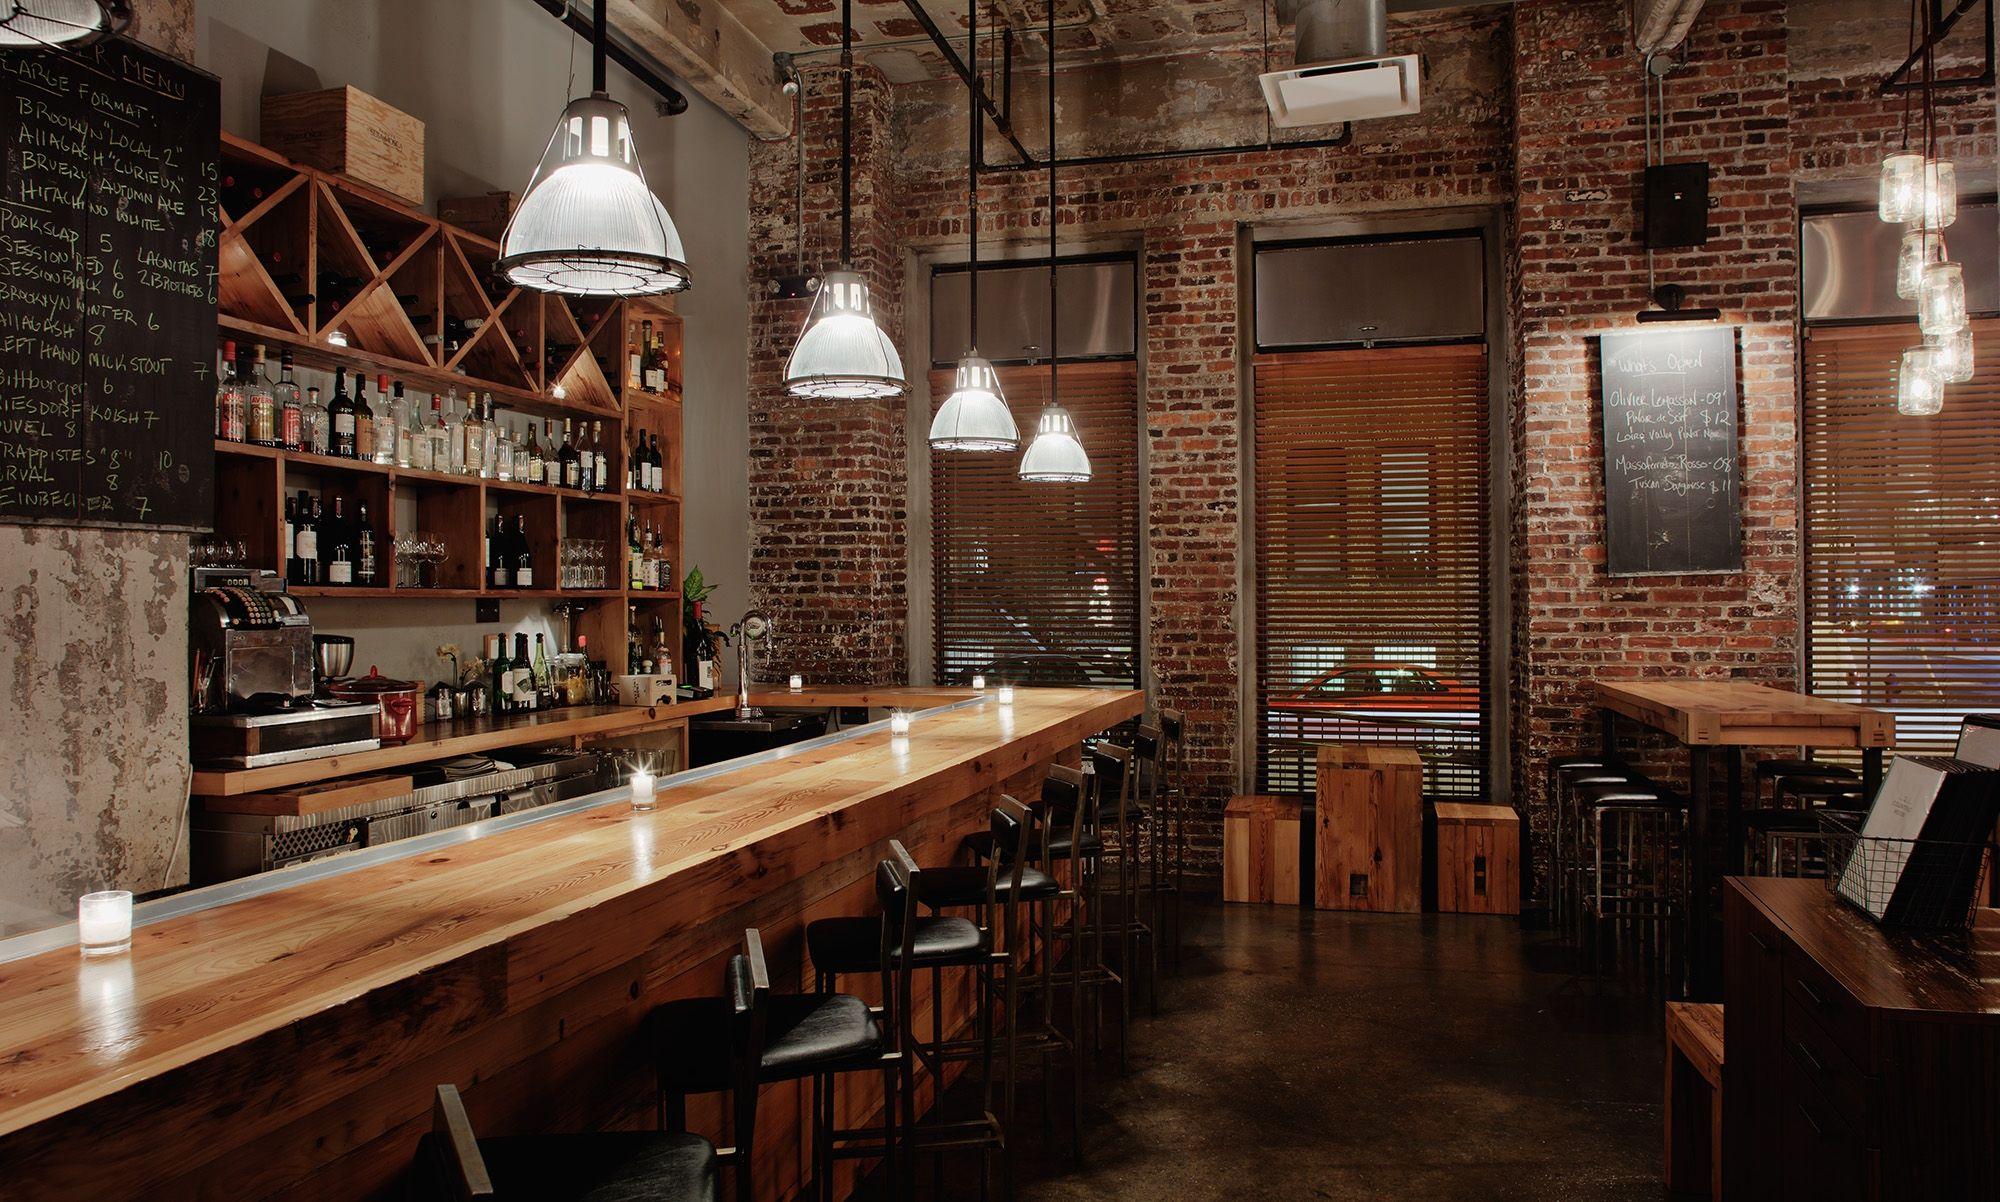 Explore House Restaurant, Restaurant Interiors And More